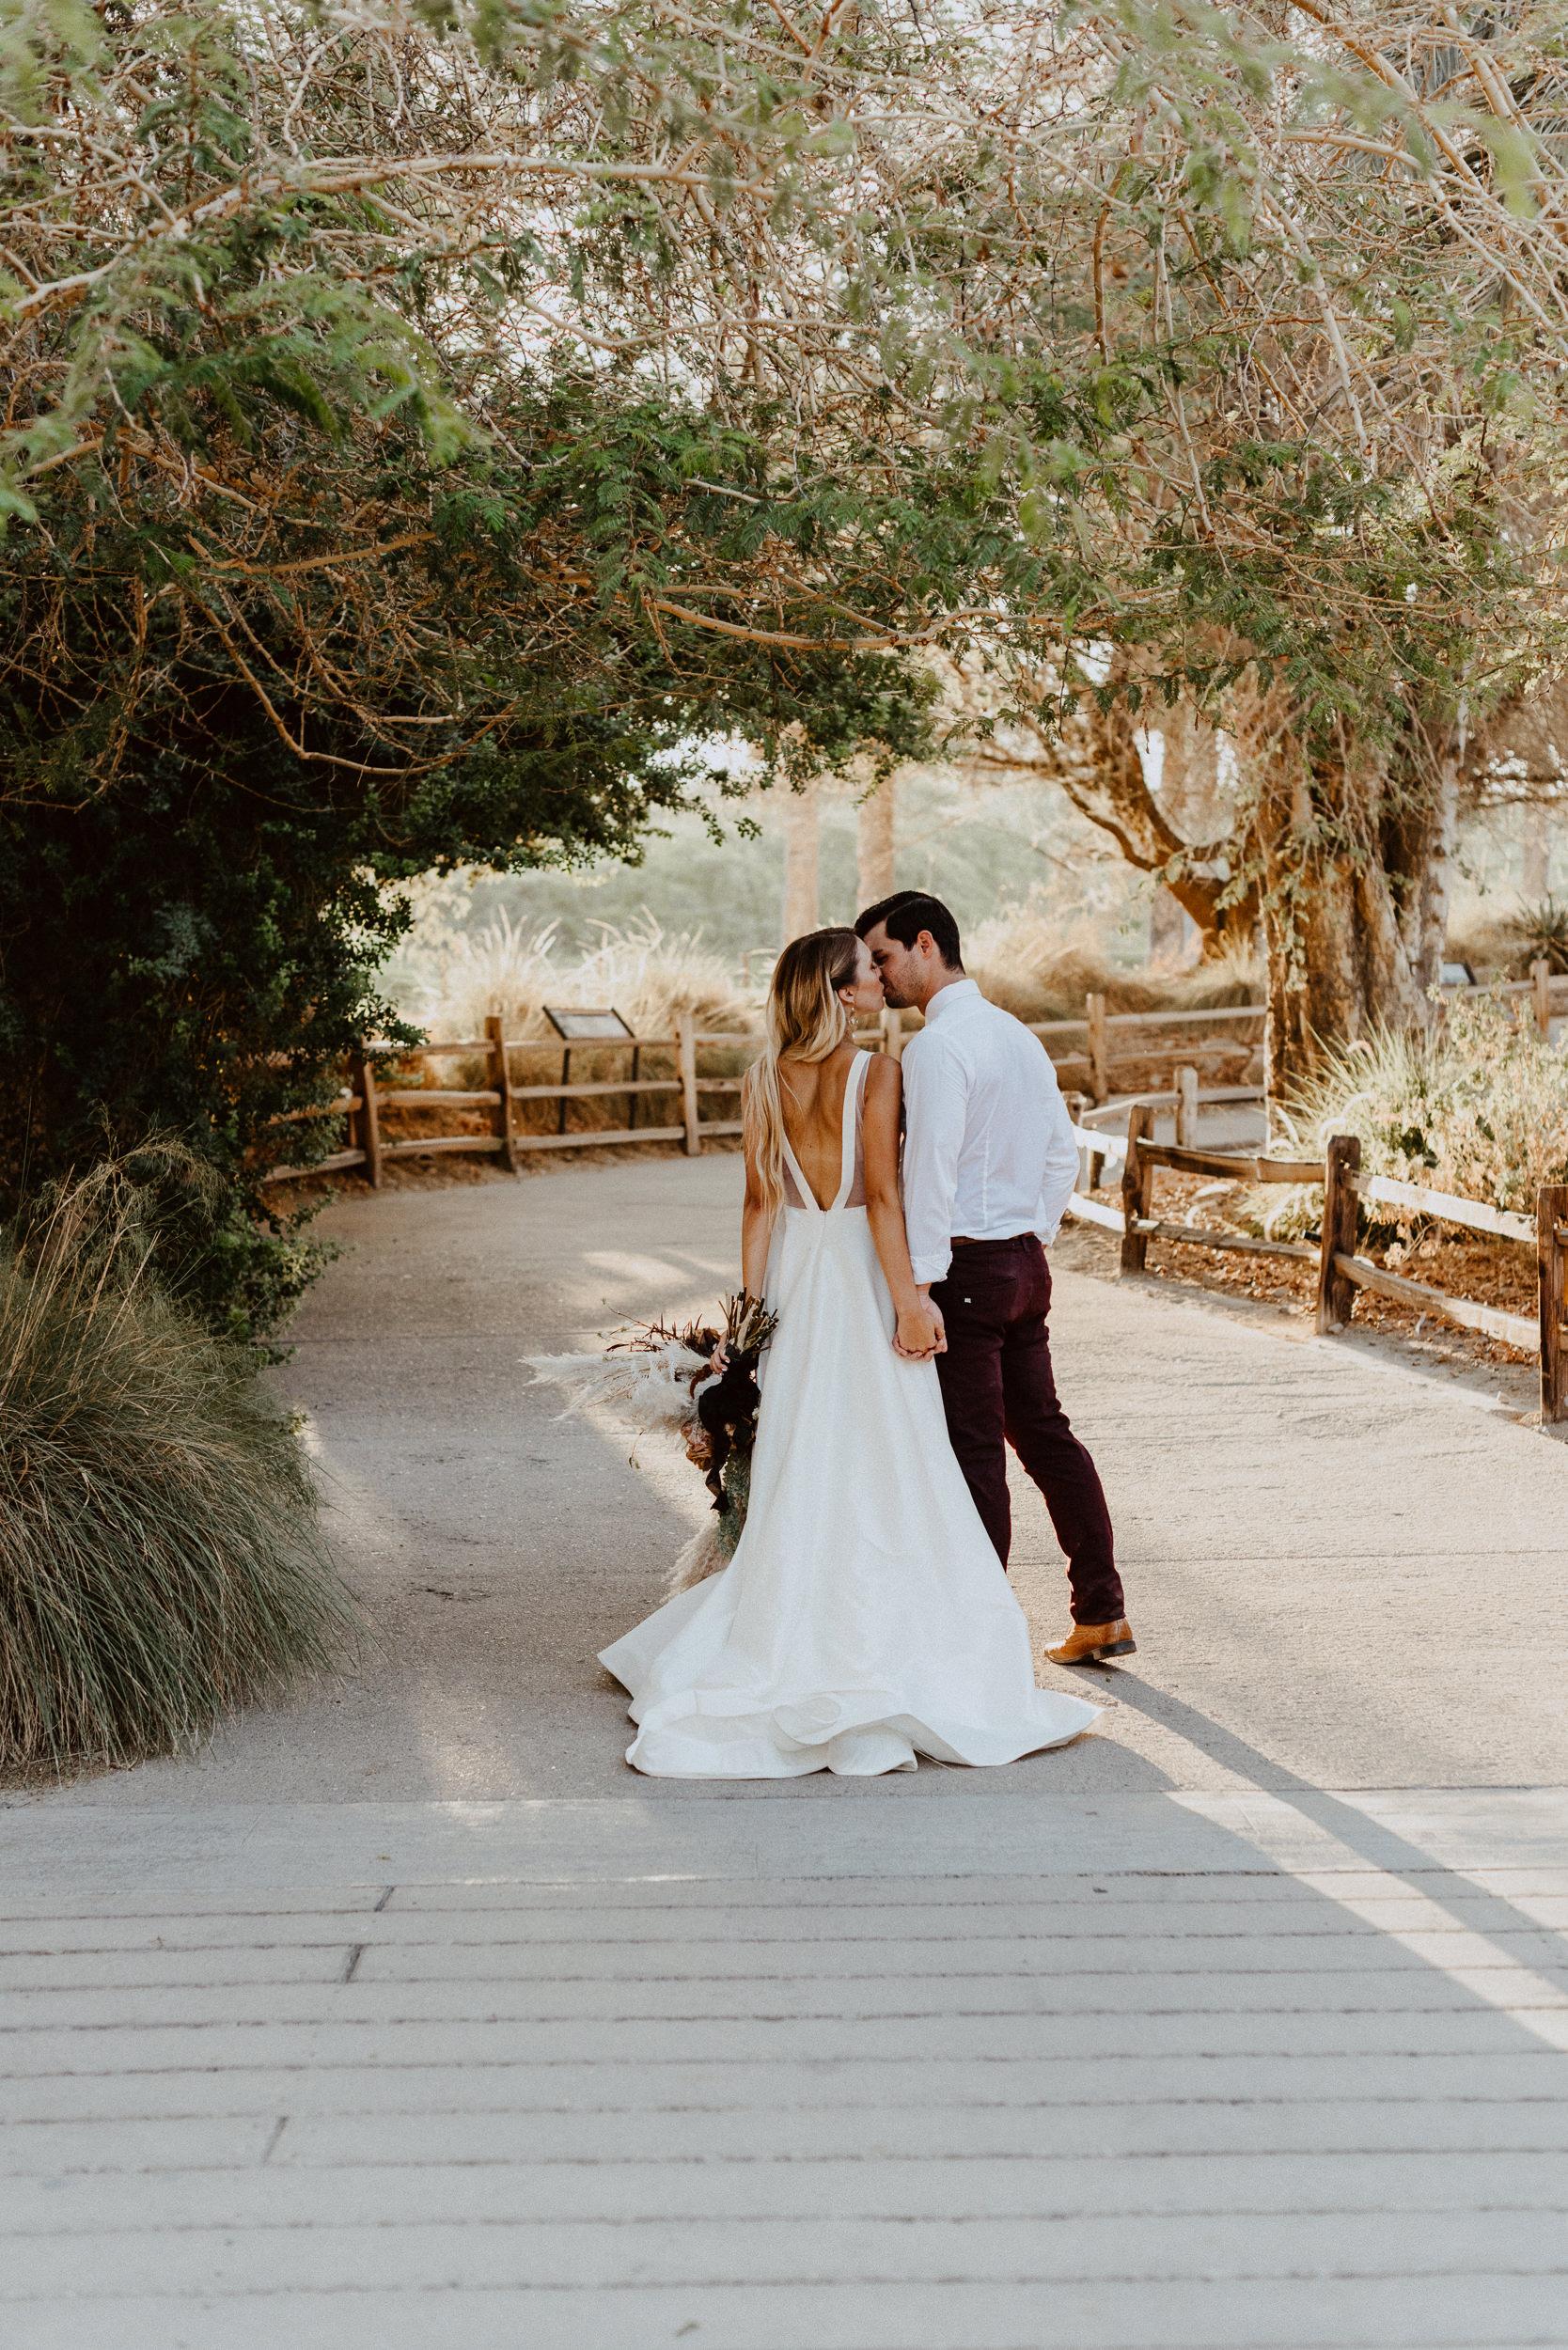 sChelsie + Chris - The Desert Shootout Wedding Romantics at The Living Desert-134.jpg